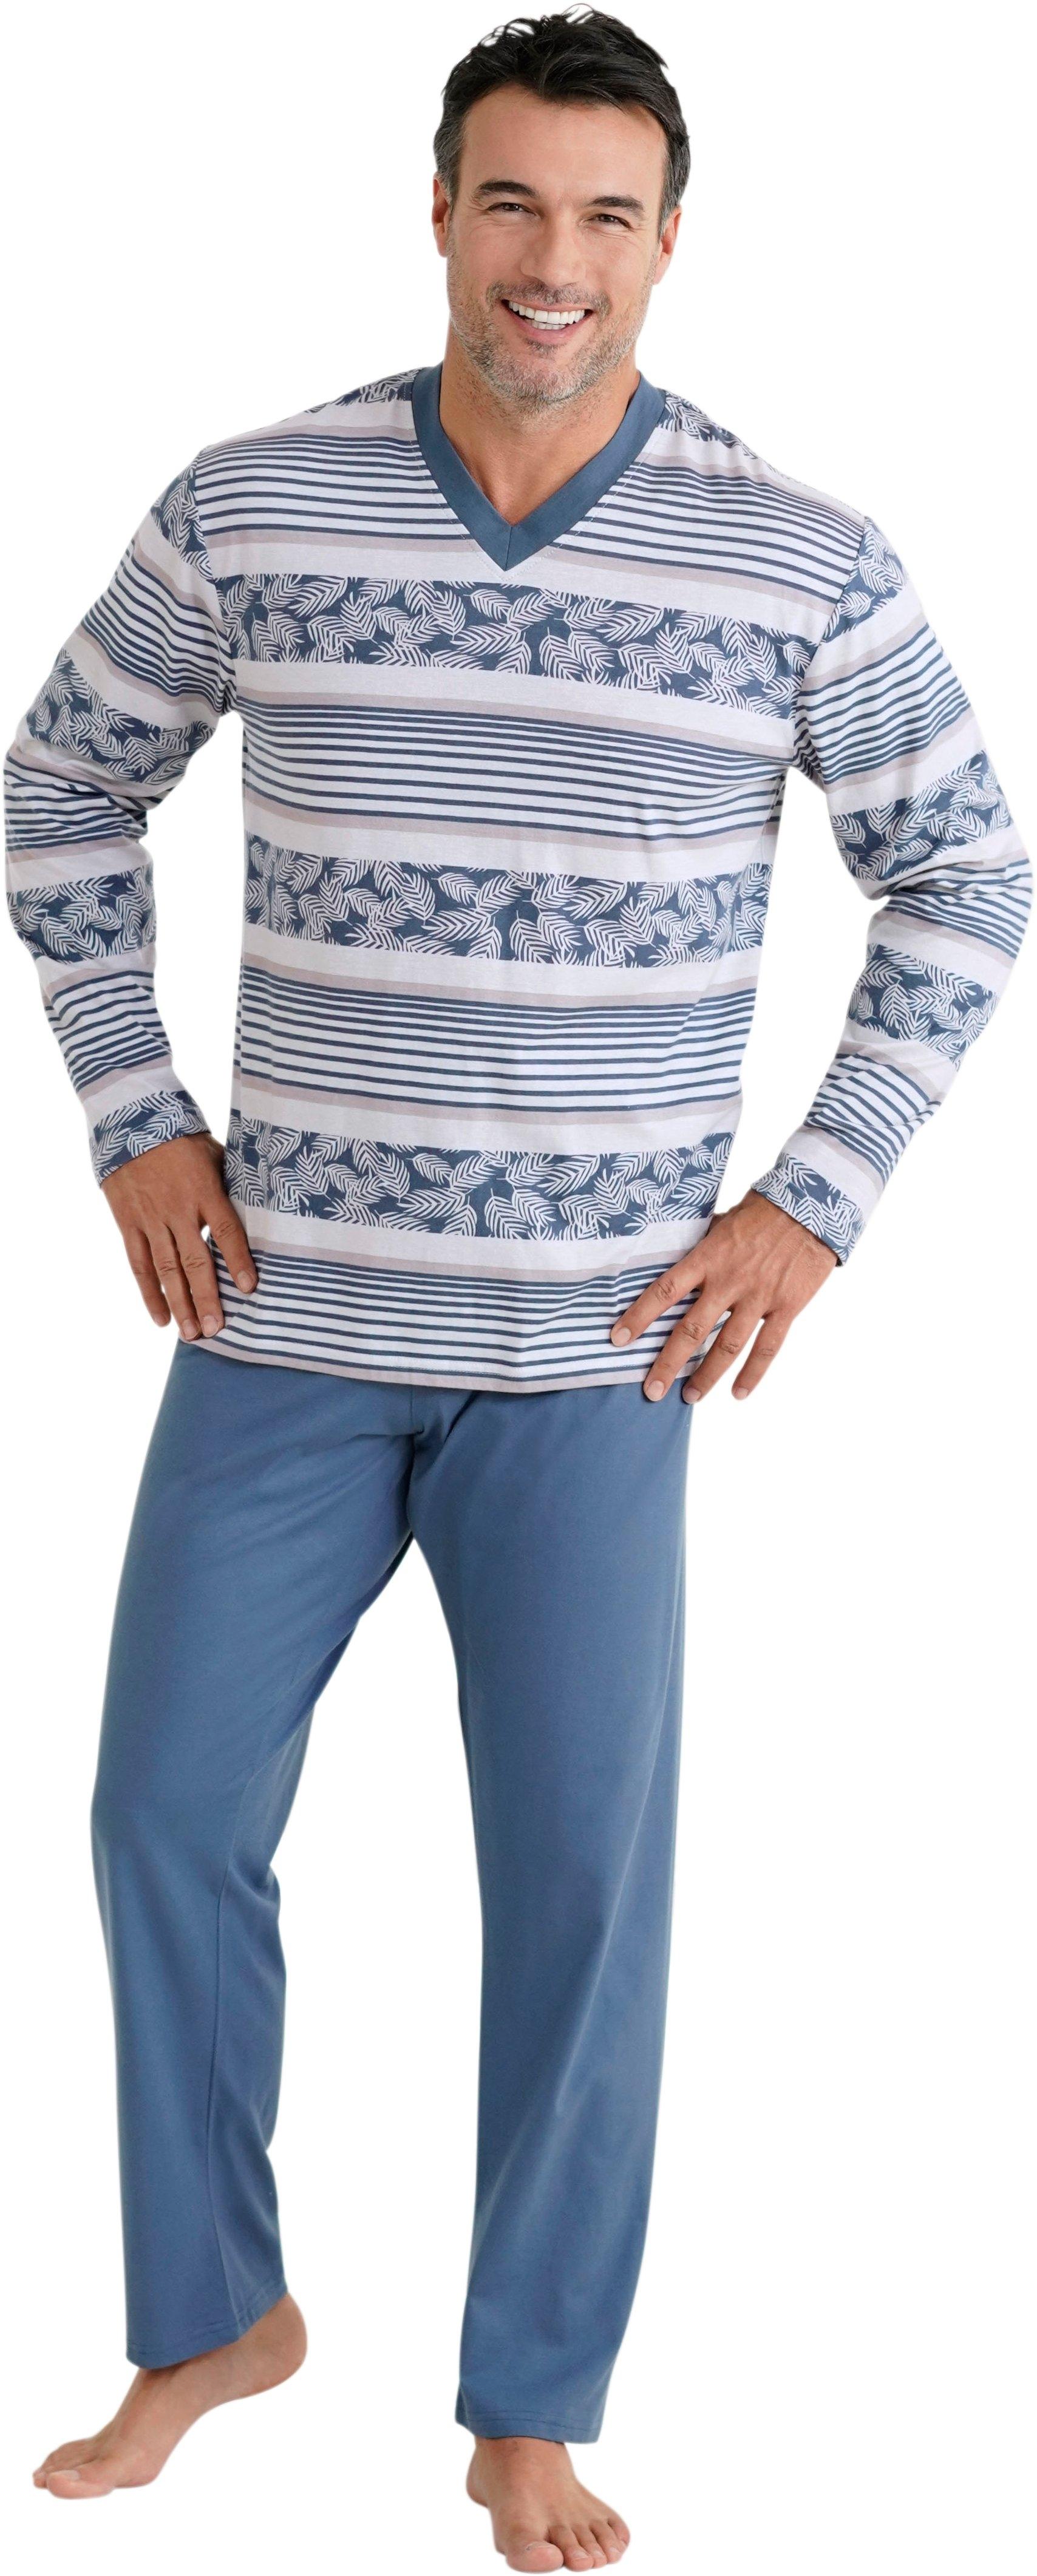 Bestellen Bij Bij Wäschepur Wäschepur Pyjama Bestellen Pyjama Pyjama Wäschepur Wäschepur Pyjama Bij Bestellen Bestellen 4RqA53Lj